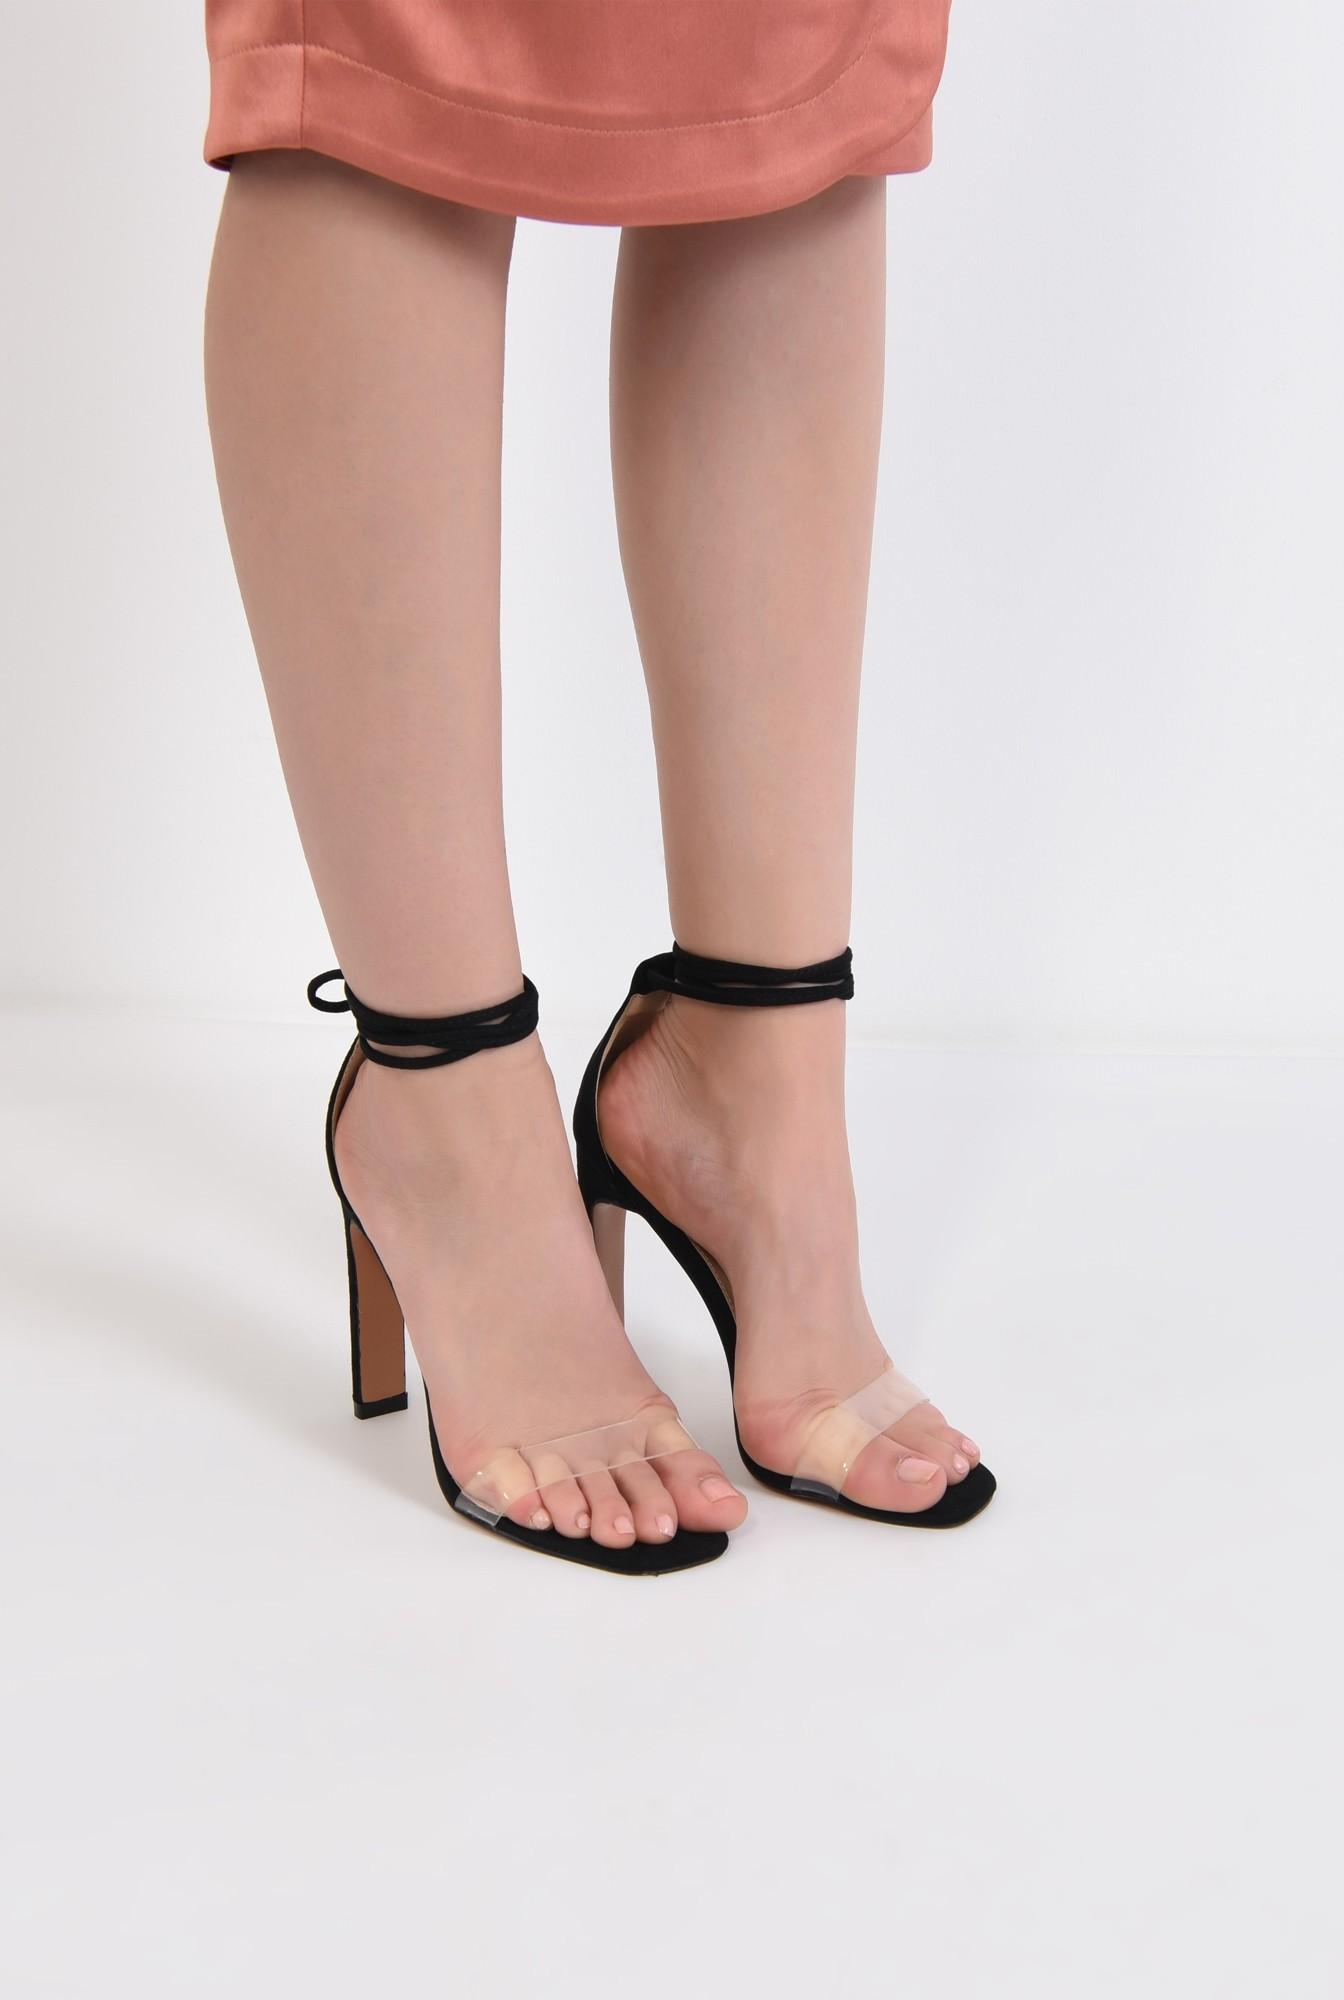 4 - sandale de ocazie, din velur, bareta transparenta, toc bricheta